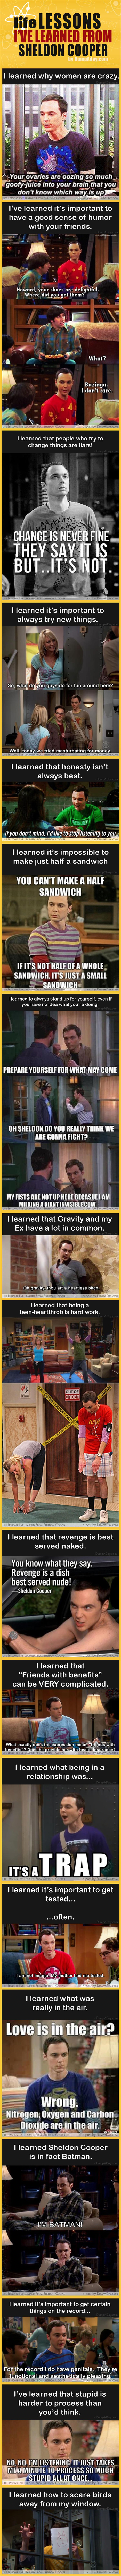 18 Lessons I've Learned From Sheldon Cooper